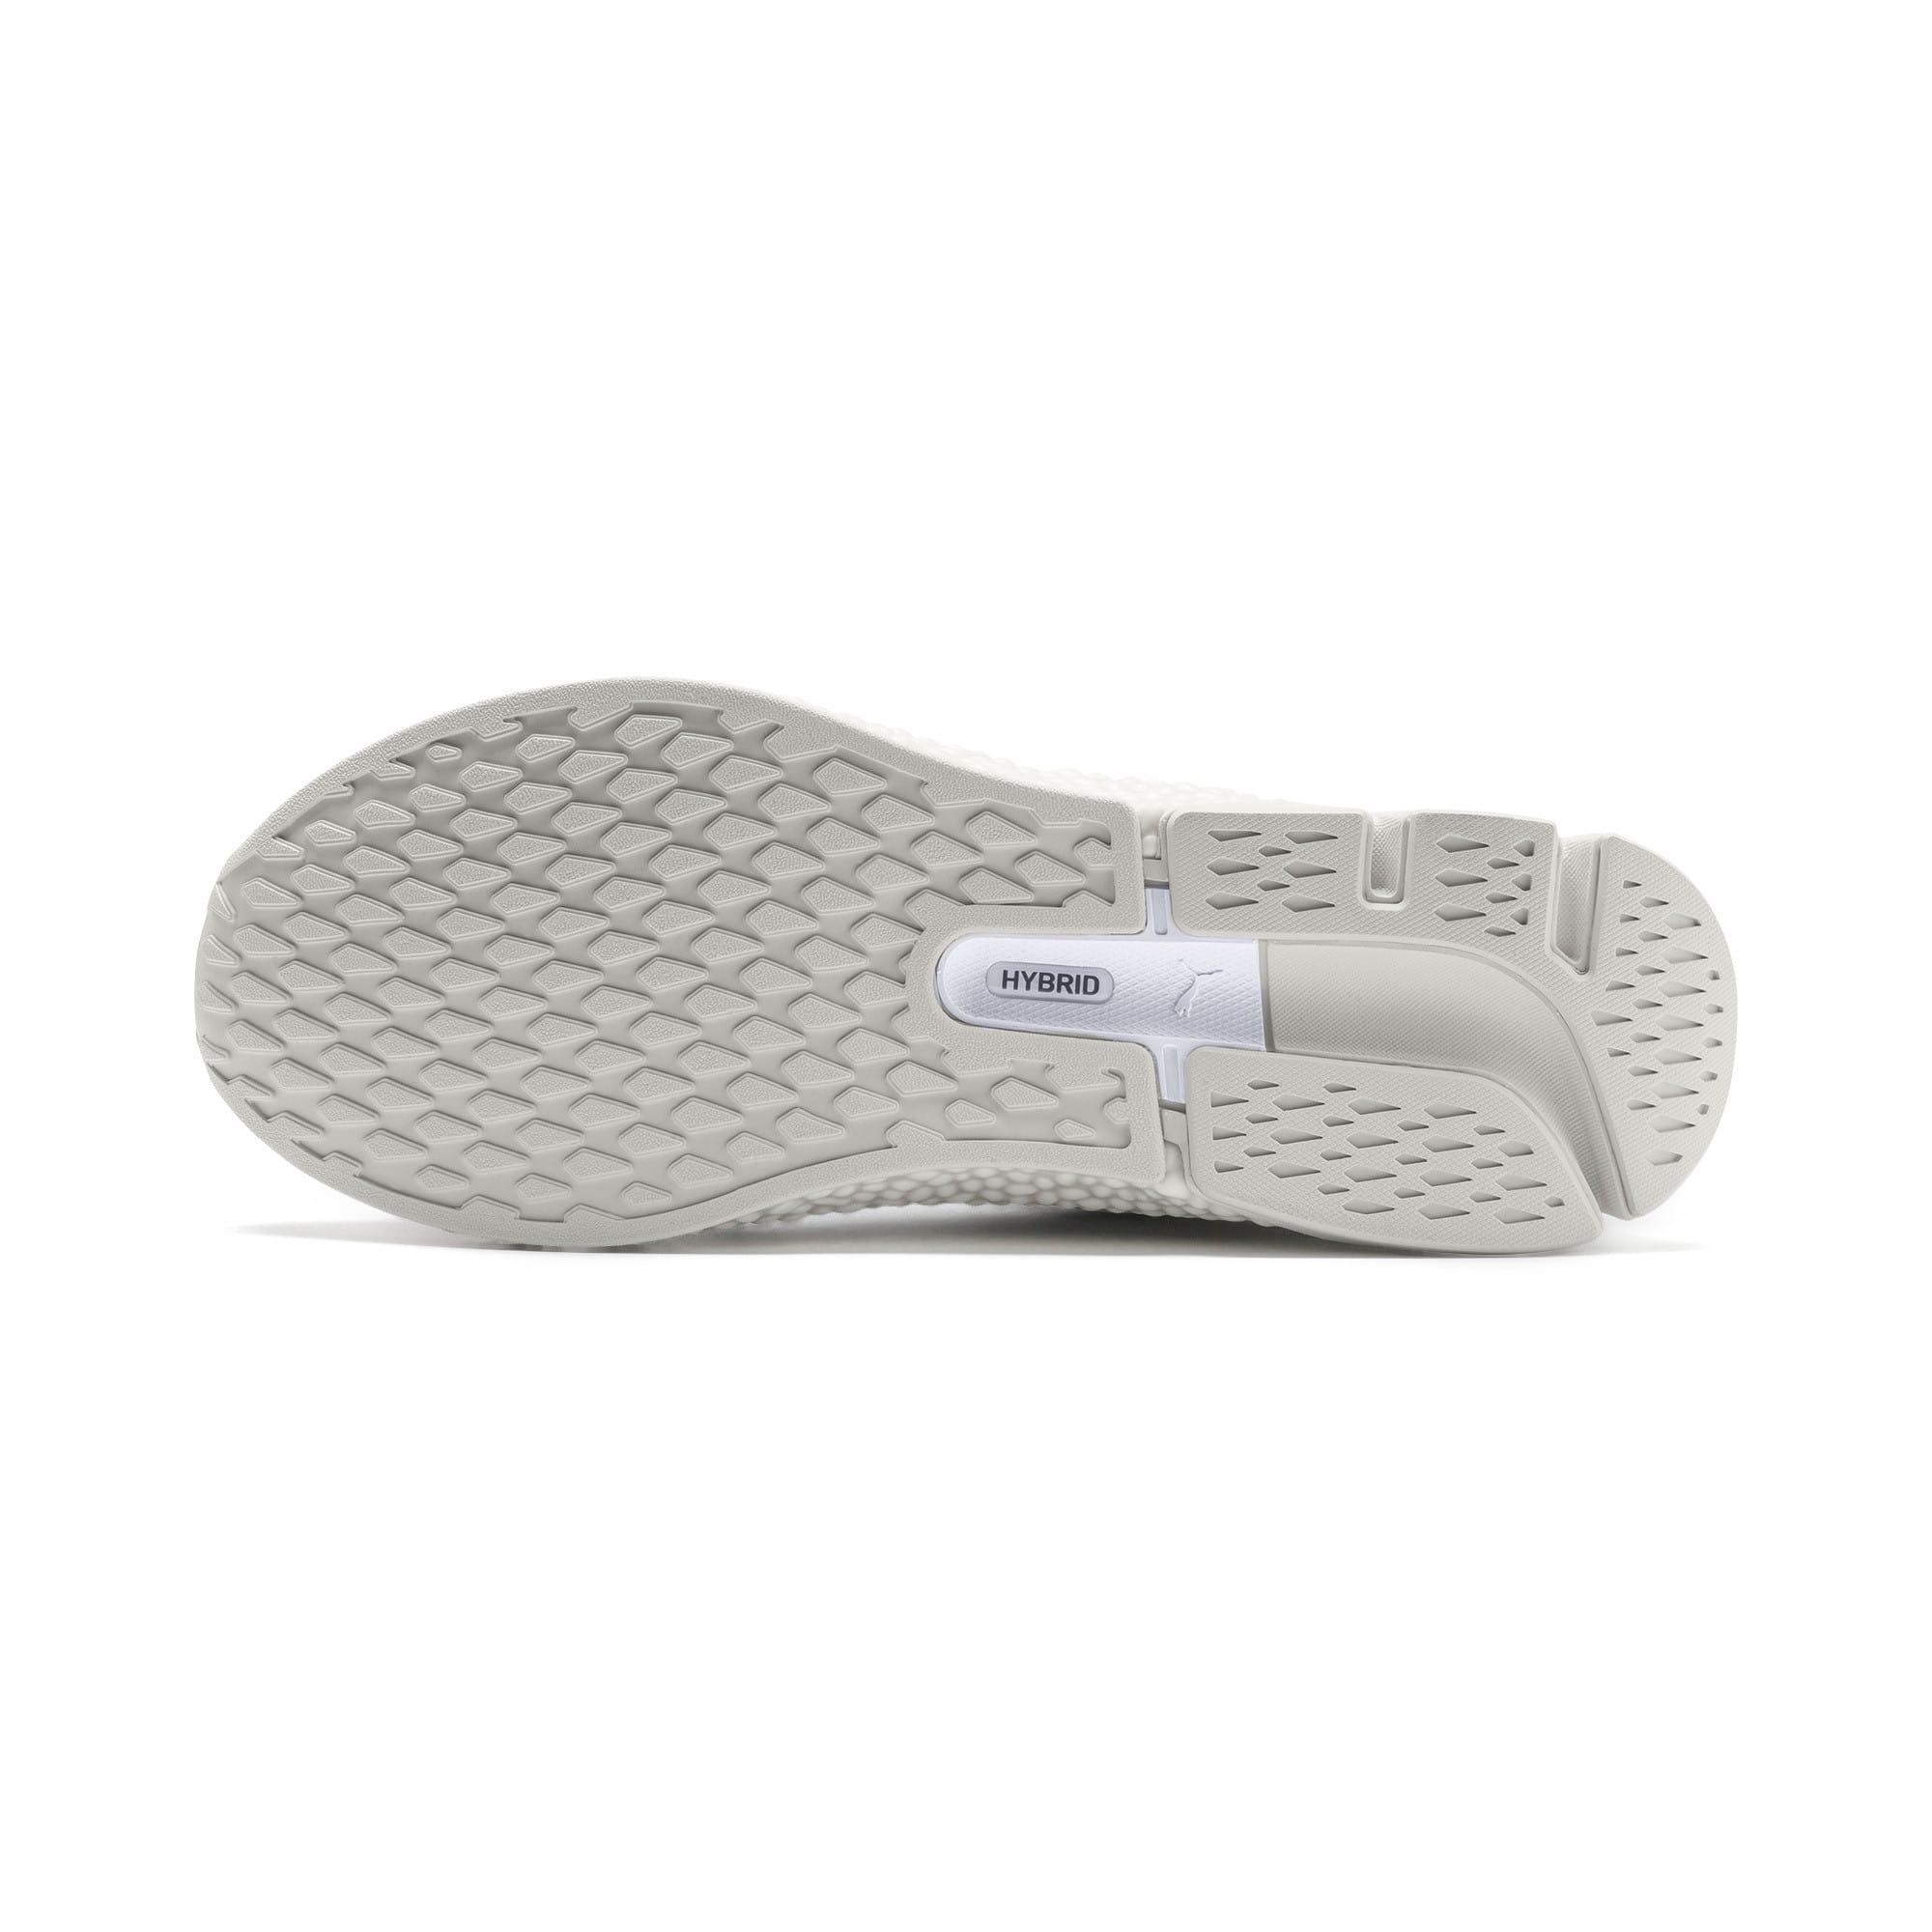 Thumbnail 5 of HYBRID Sky Lights Men's Running Shoes, Puma White-Puma Silver, medium